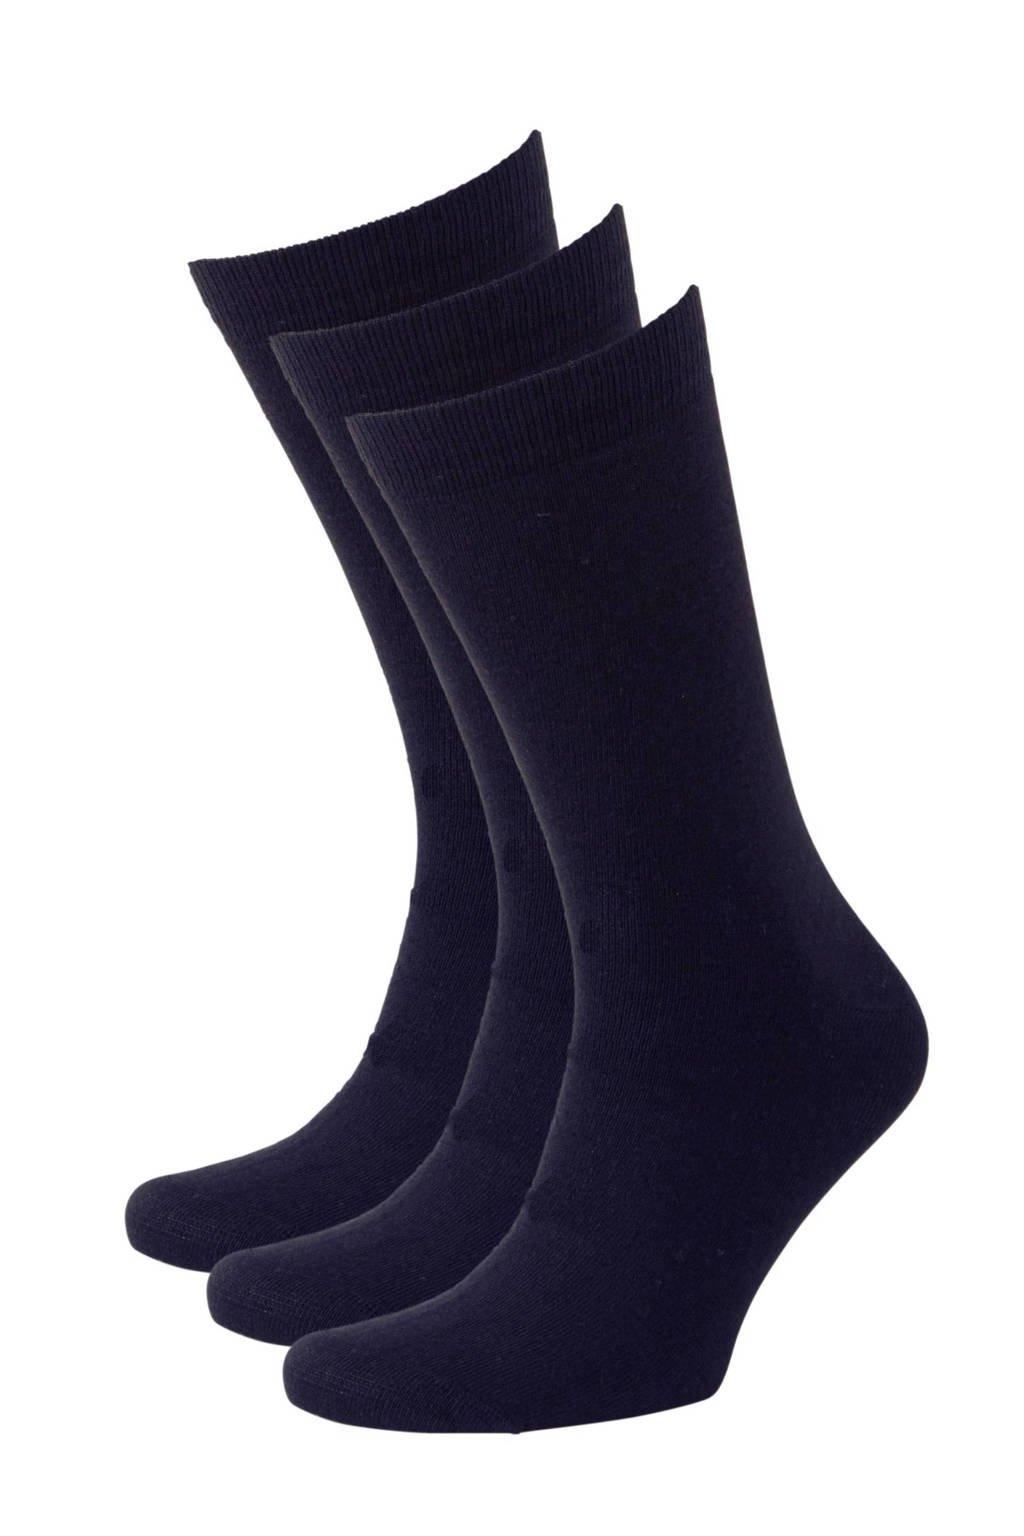 whkmp's own sokken wol (3 paar), Marine blauw